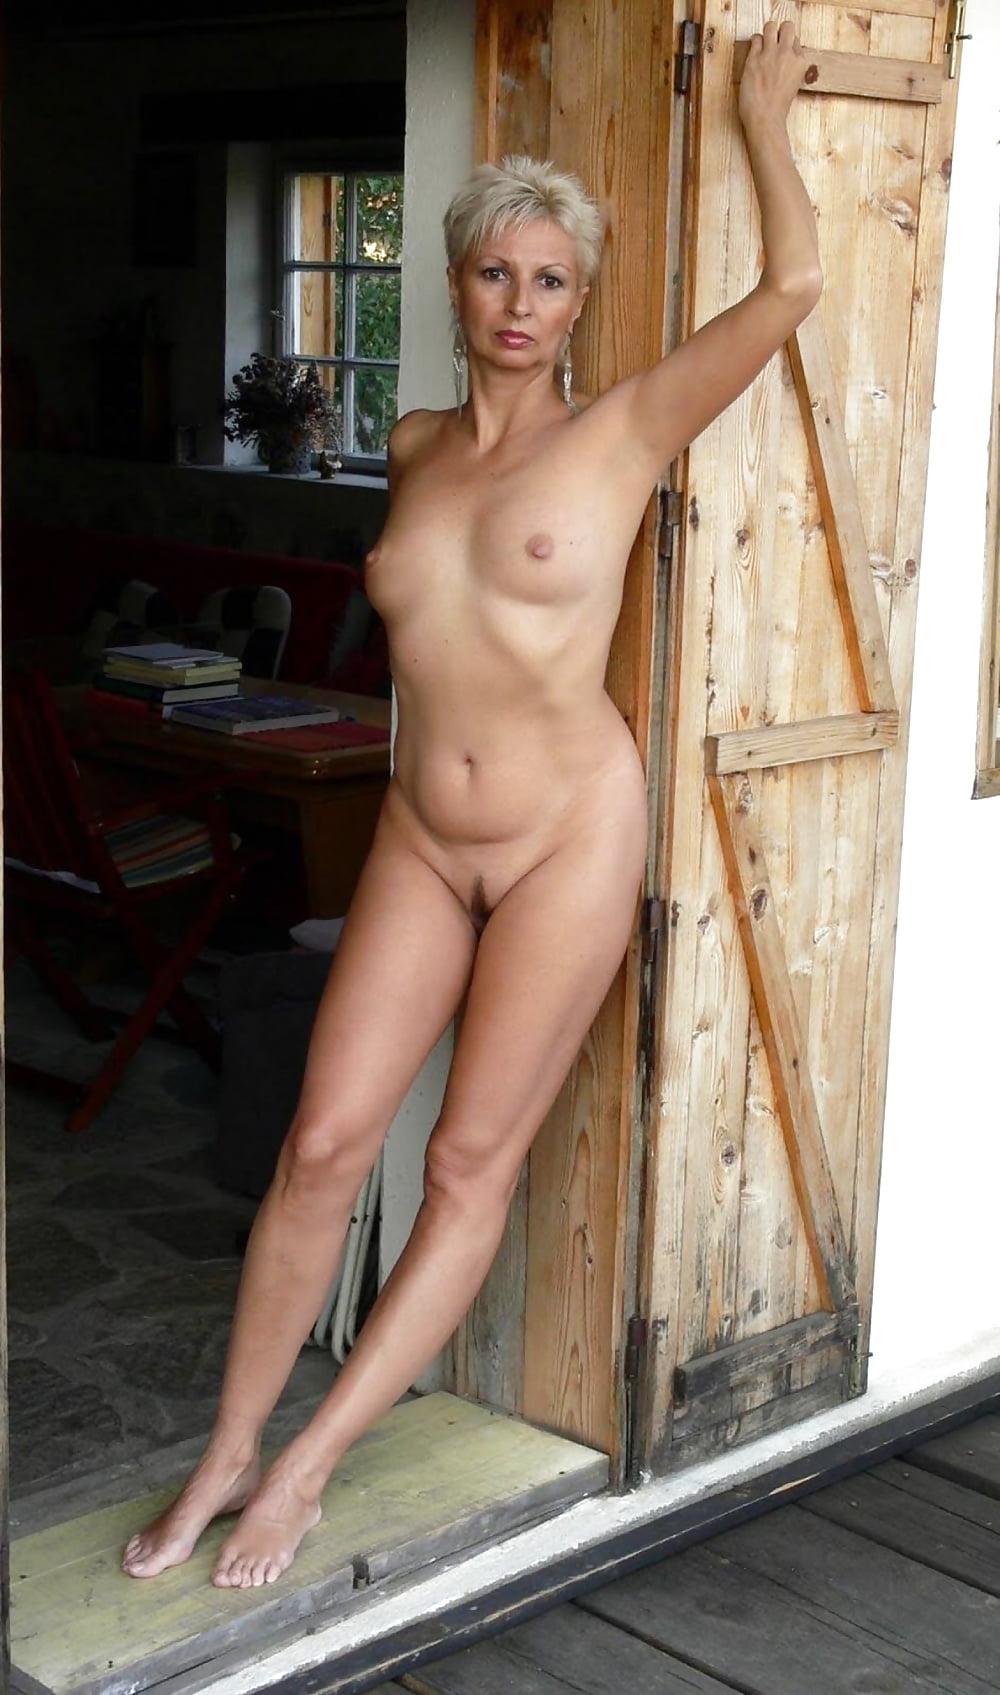 Hot cougars naked — 14